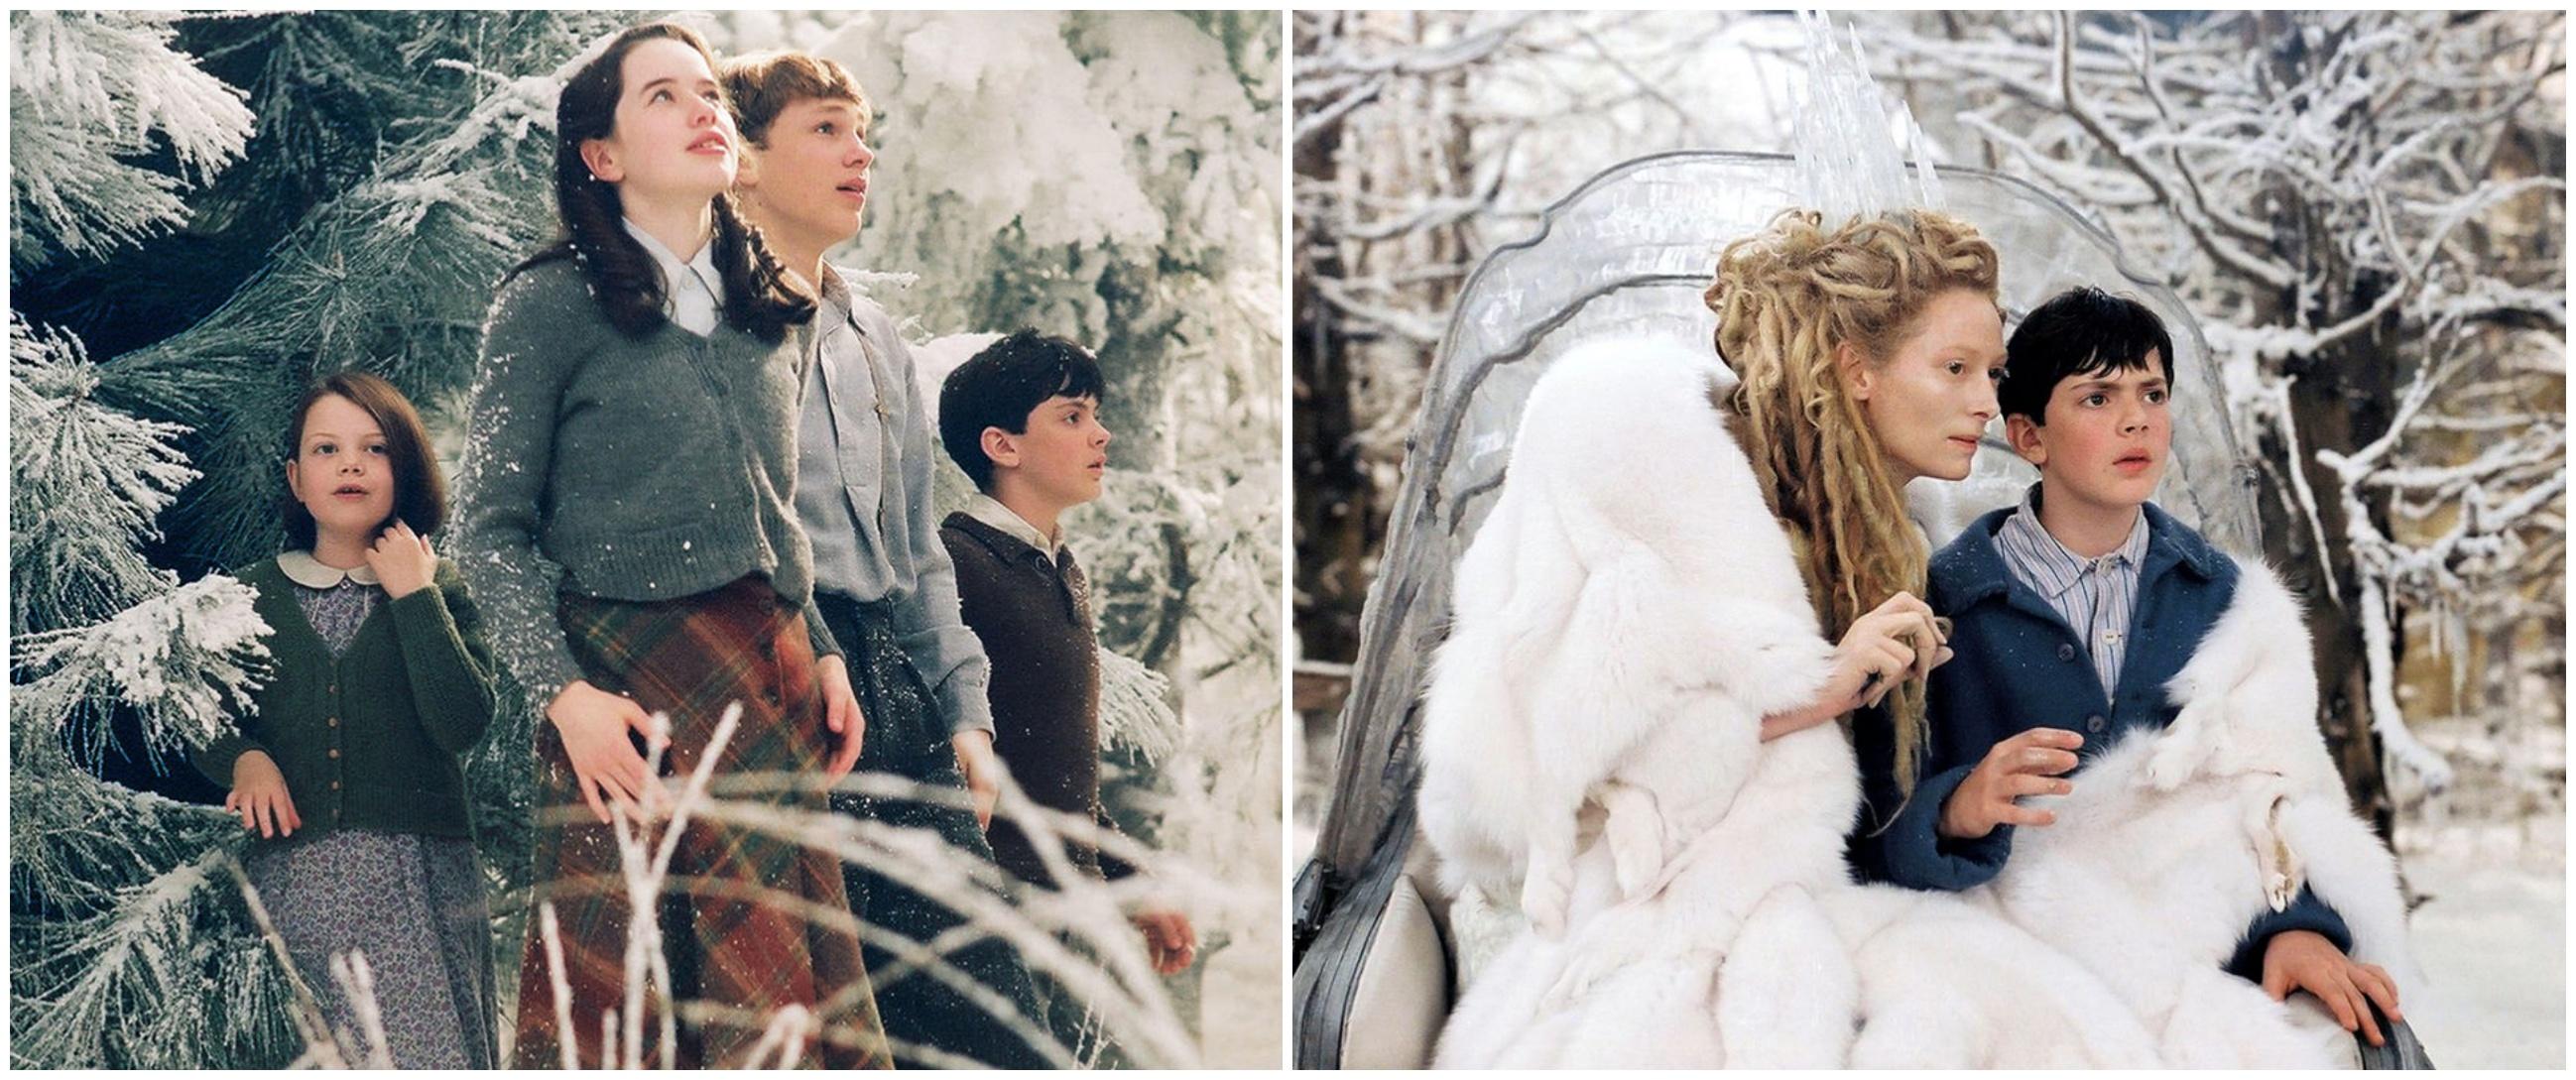 16 Tahun berlalu, ini potret dulu dan kini 7 pemain film Narnia